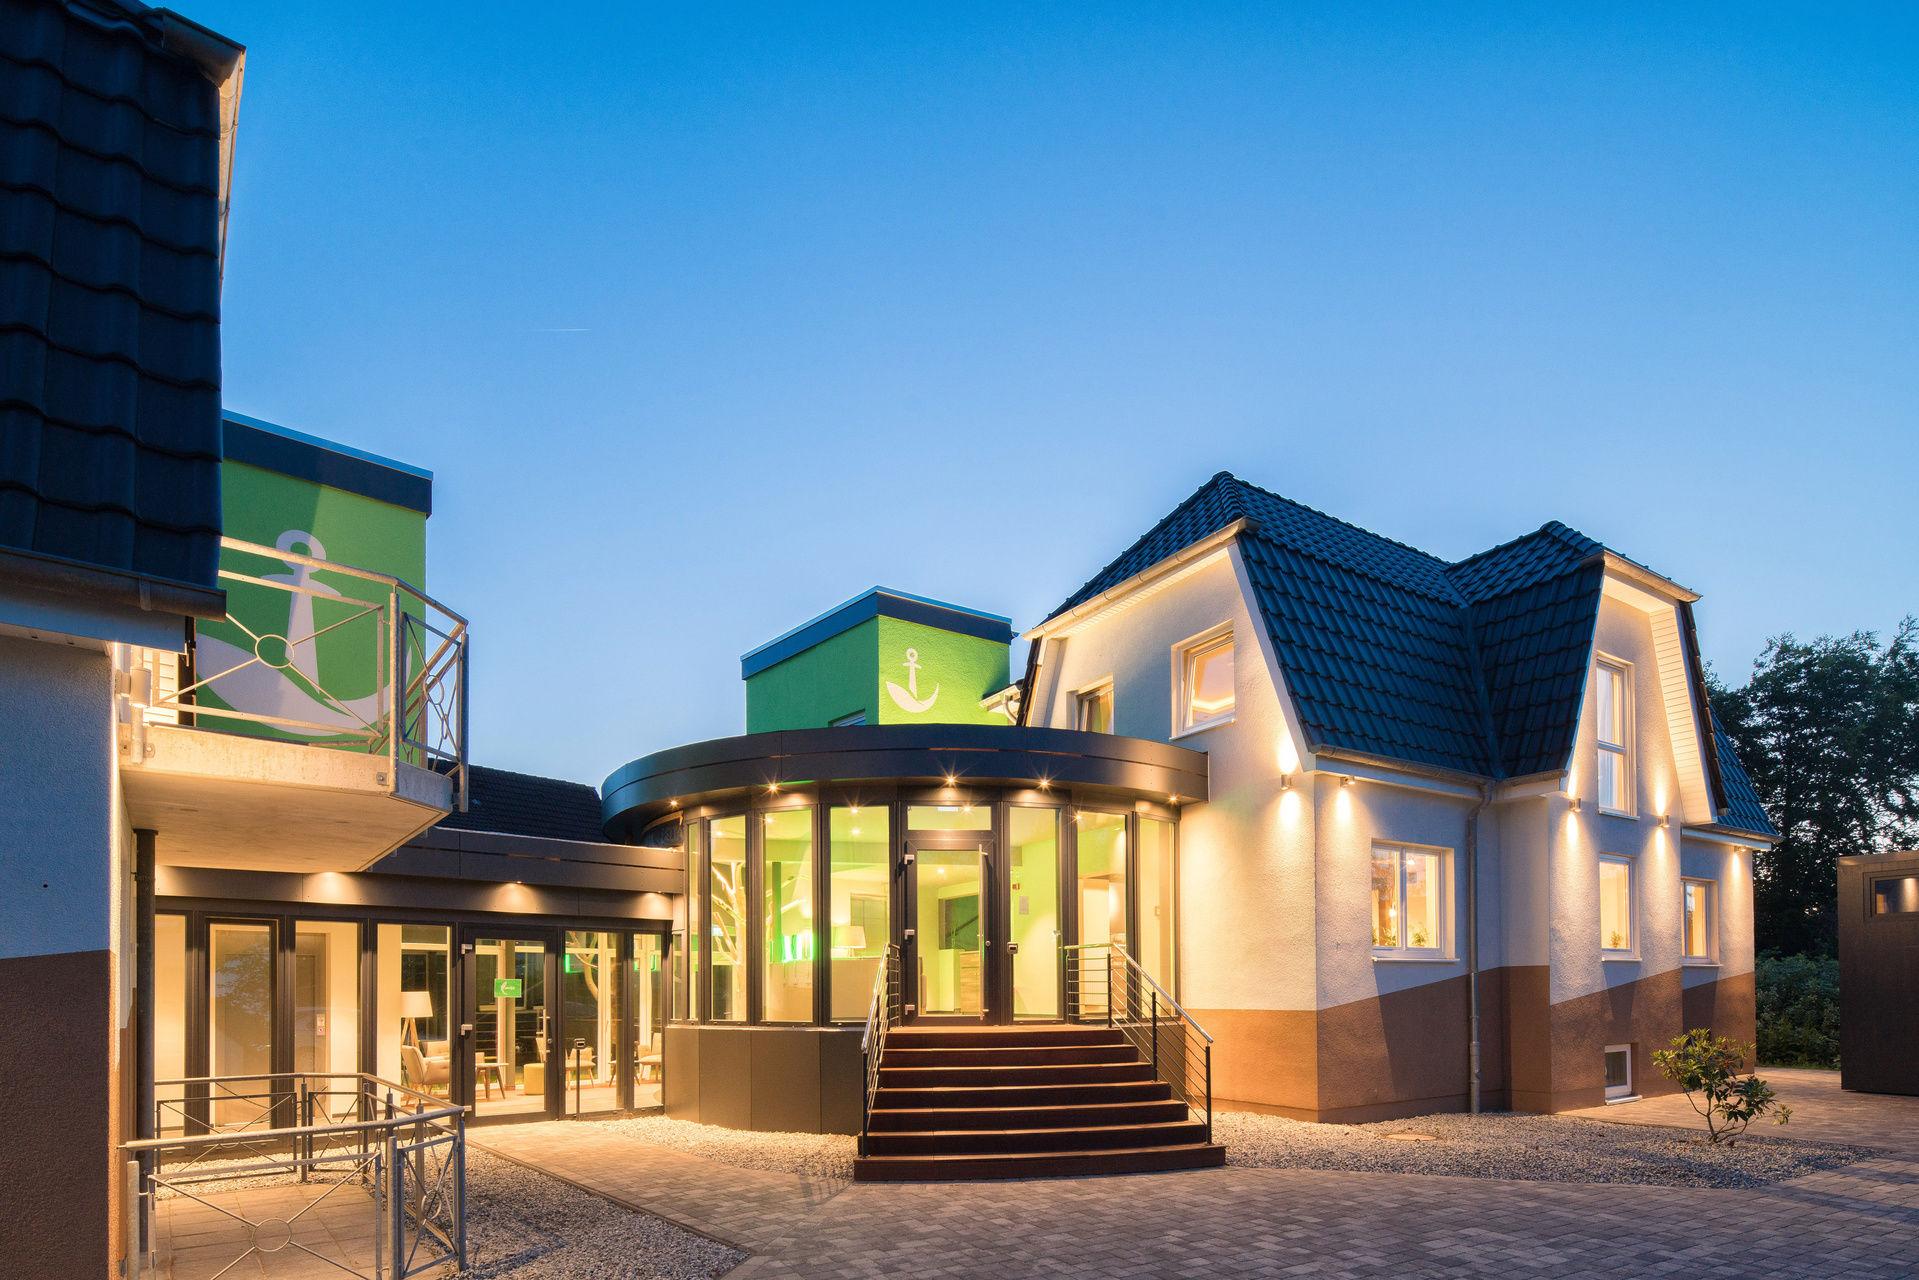 Vitalhotel pura vida hotel cuxhaven urlaub nordsee for Gunstige hotels nordsee